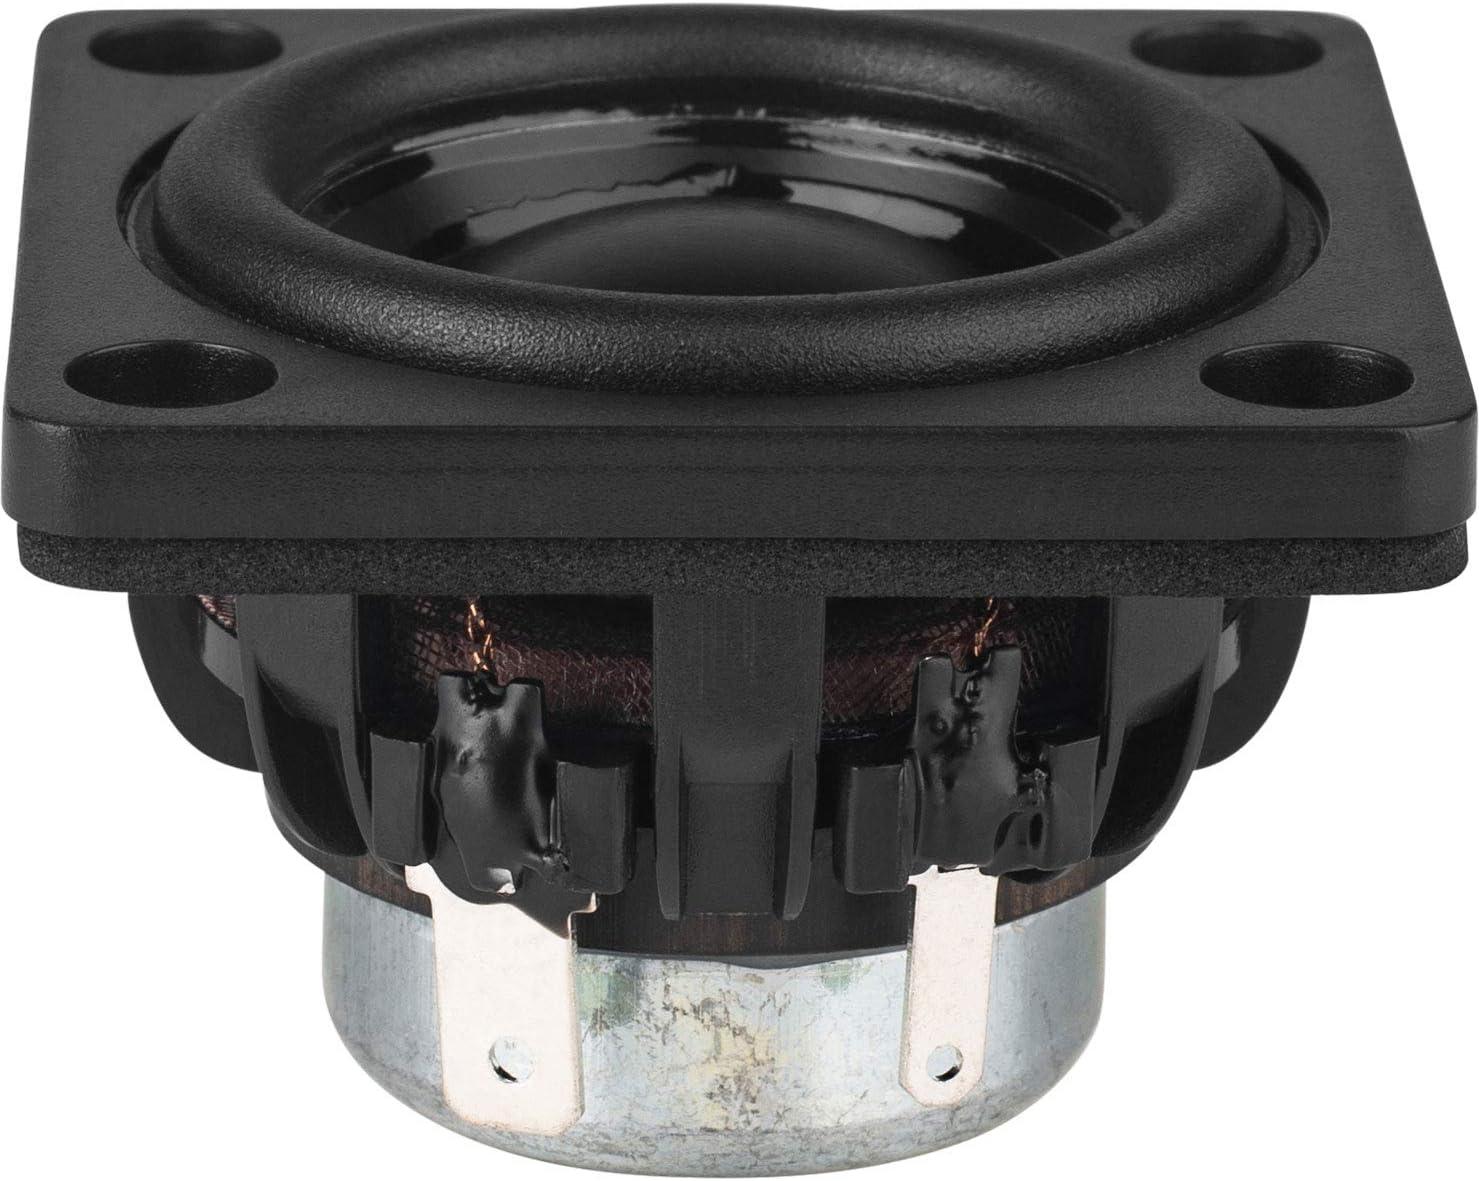 "Dayton Audio DMA45-8 1-1/2"" Dual Magnet Aluminum Cone Full-Range Driver 8 Ohm"